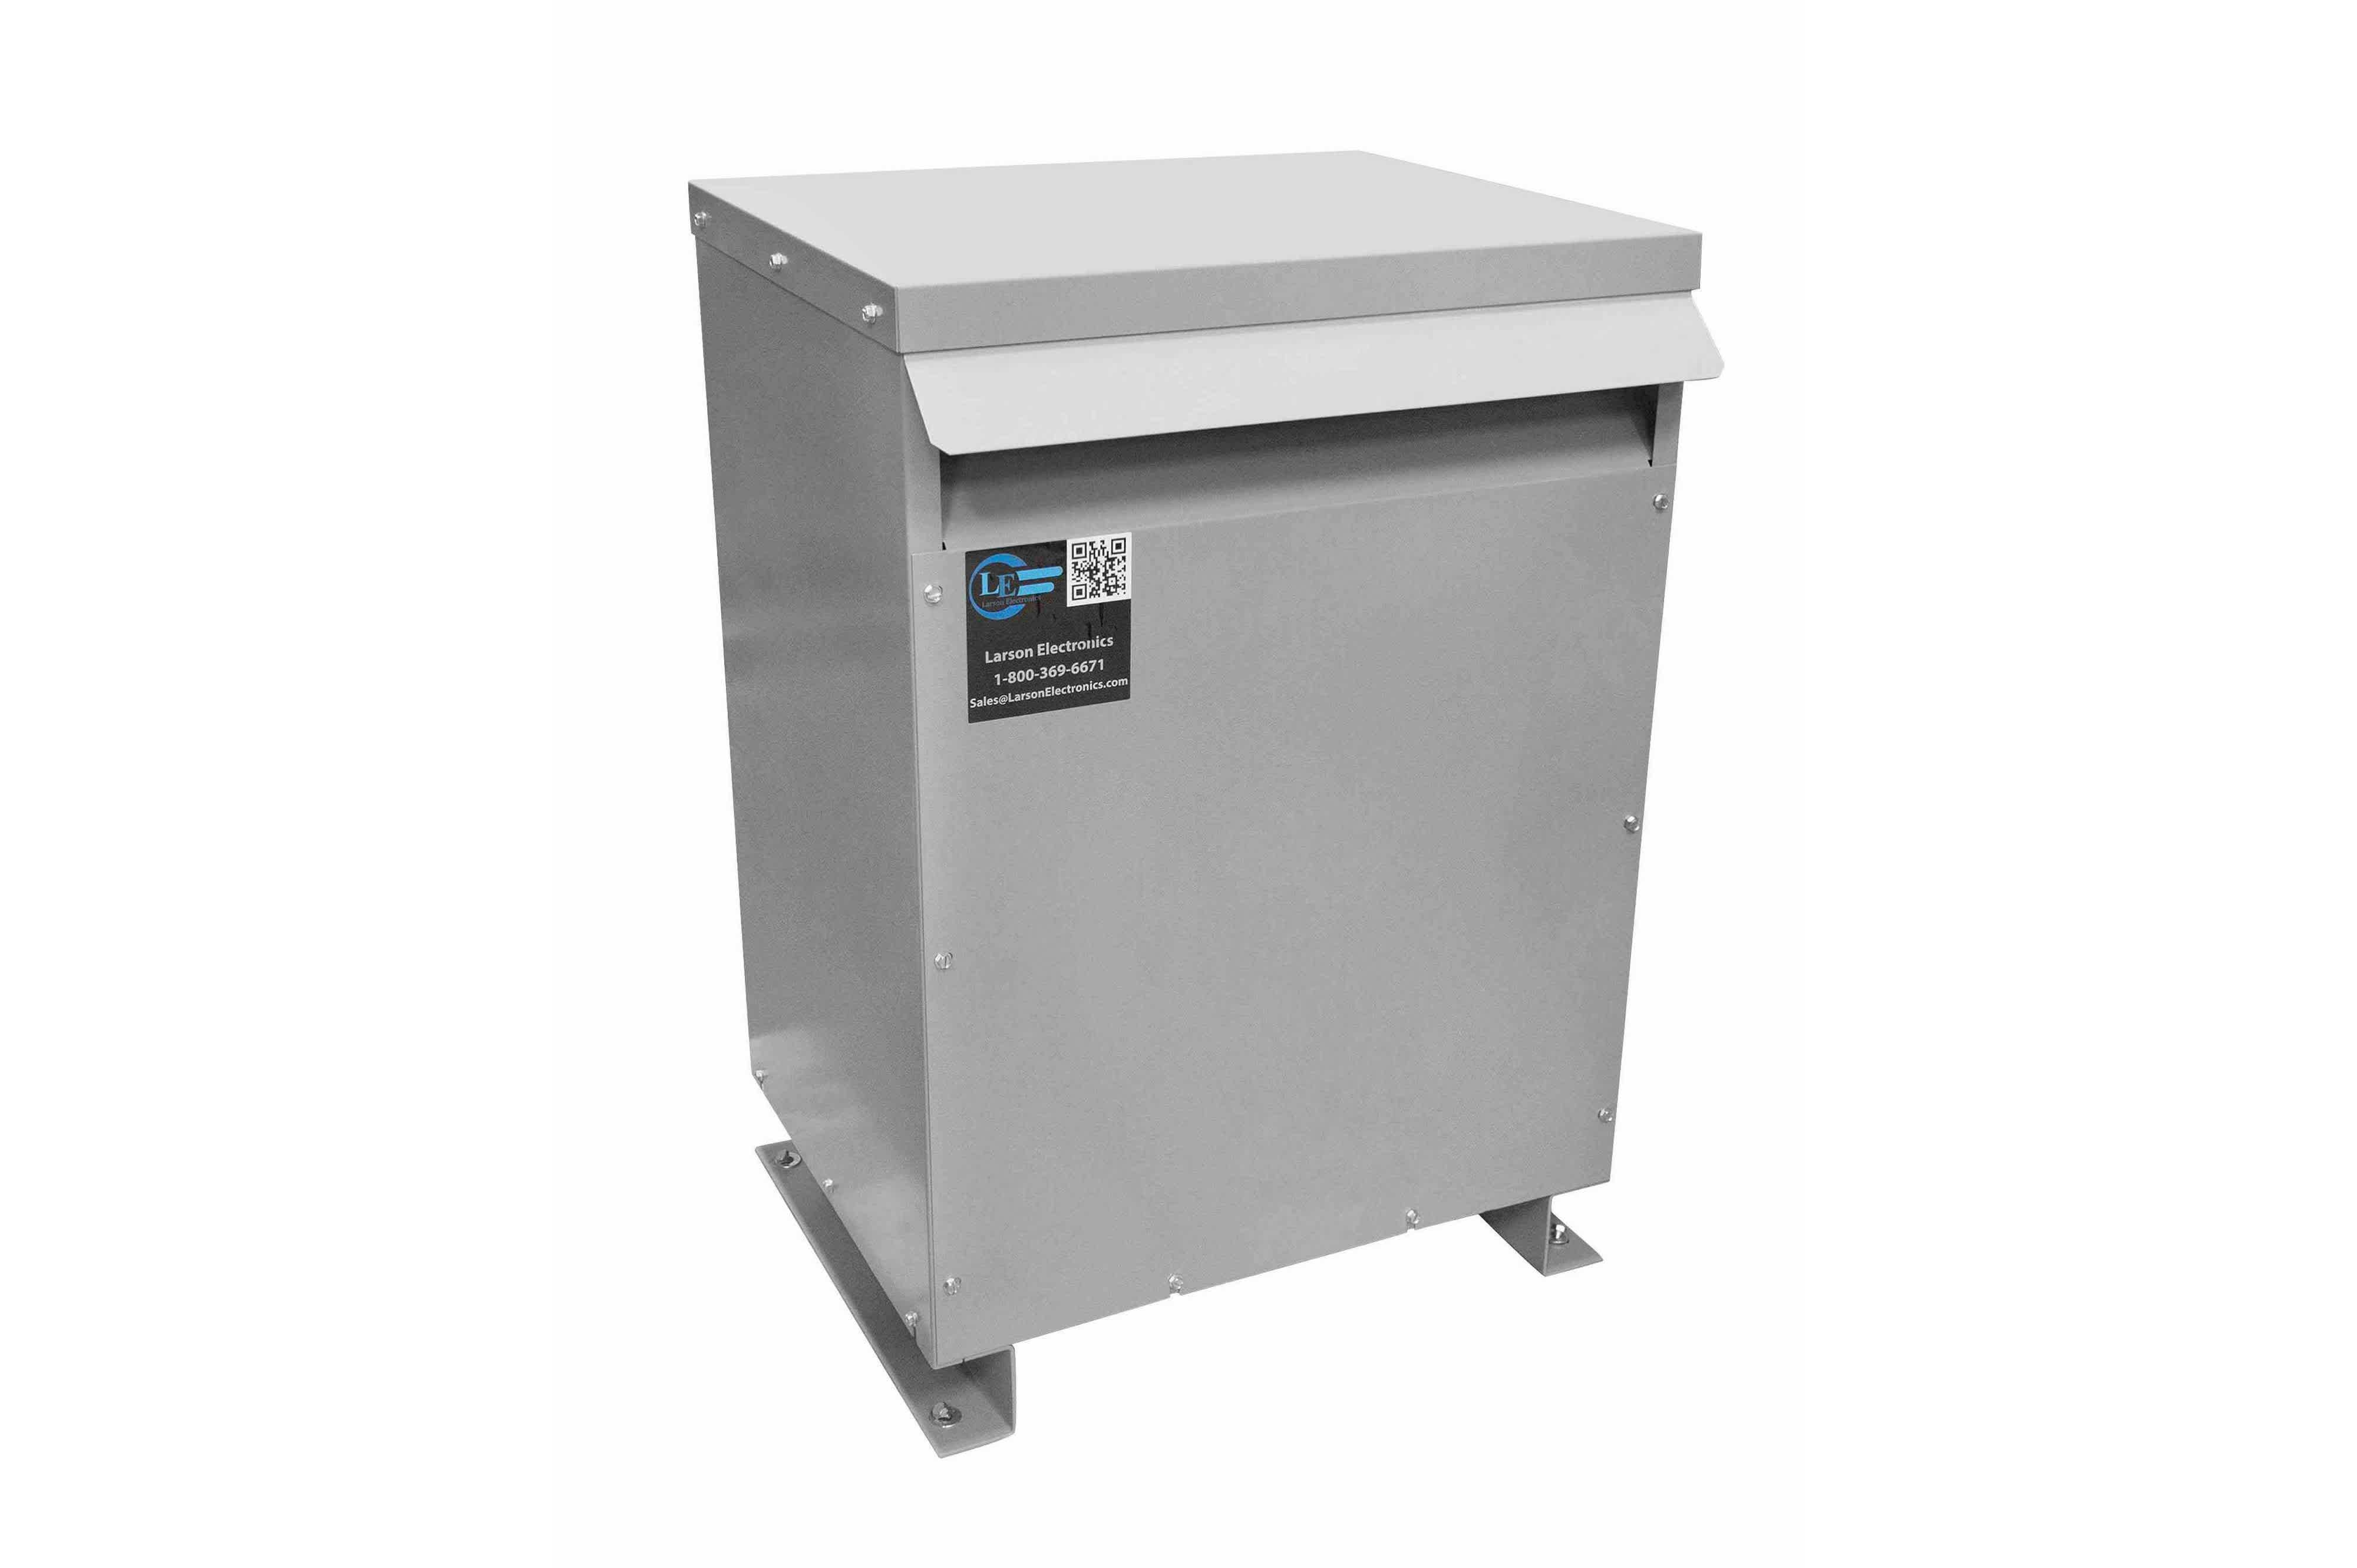 13 kVA 3PH Isolation Transformer, 440V Wye Primary, 240V/120 Delta Secondary, N3R, Ventilated, 60 Hz